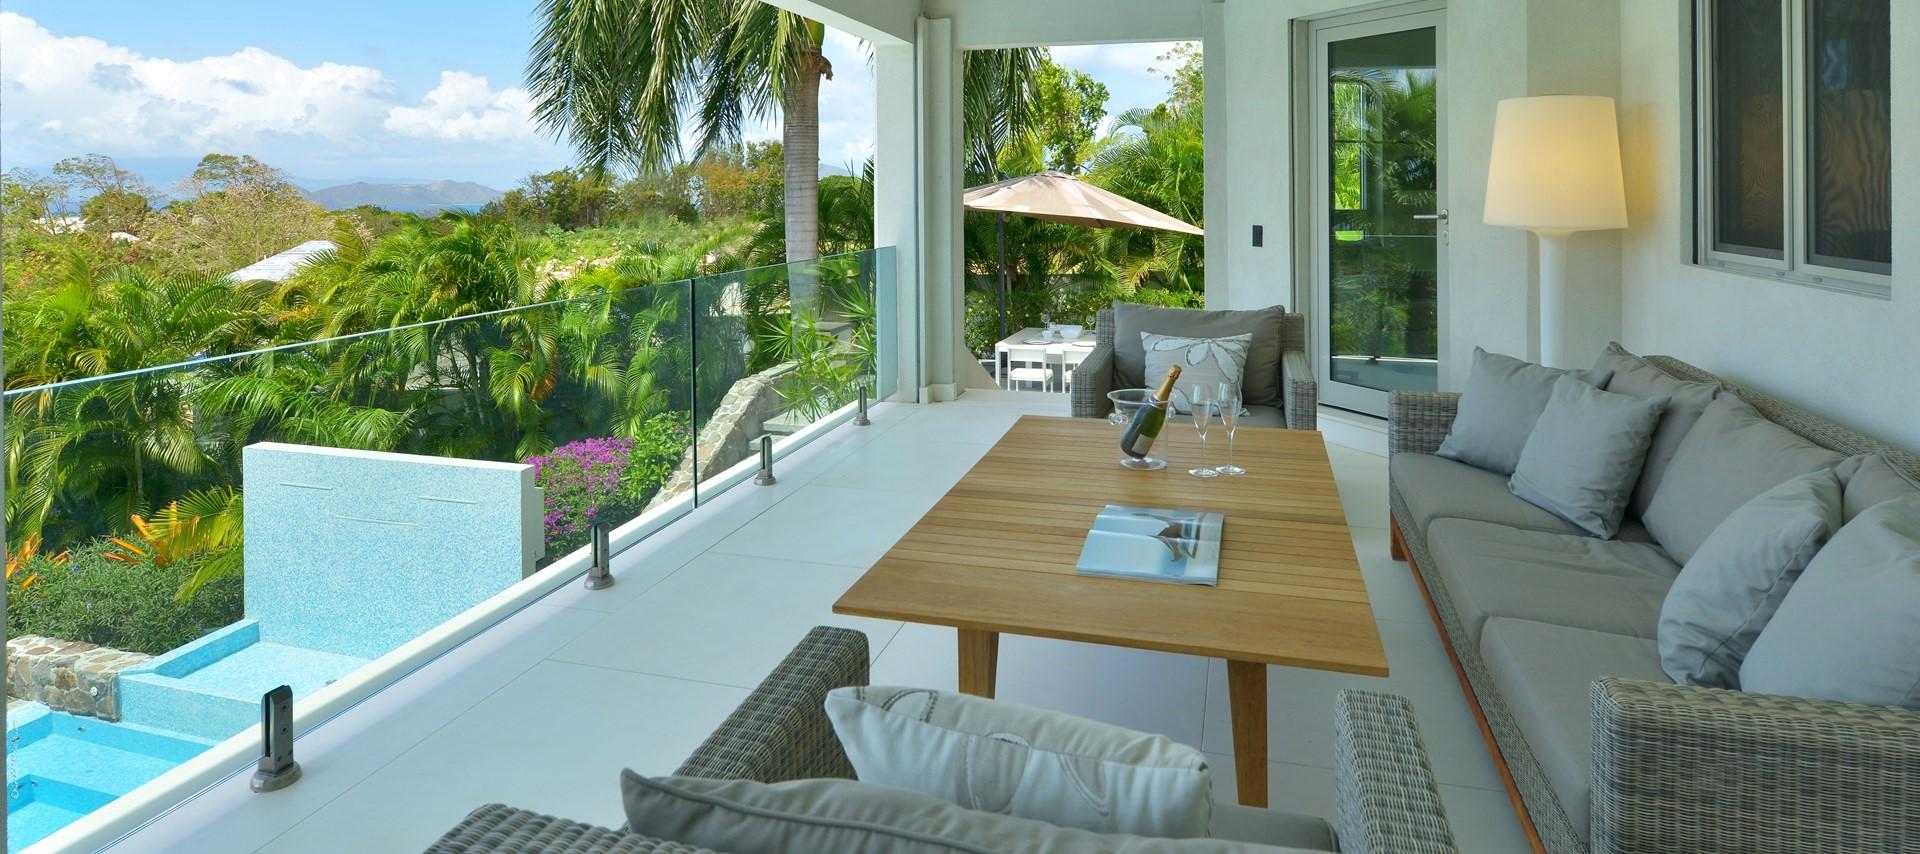 retreat-villa-nevis-outdoor-lounge-terra